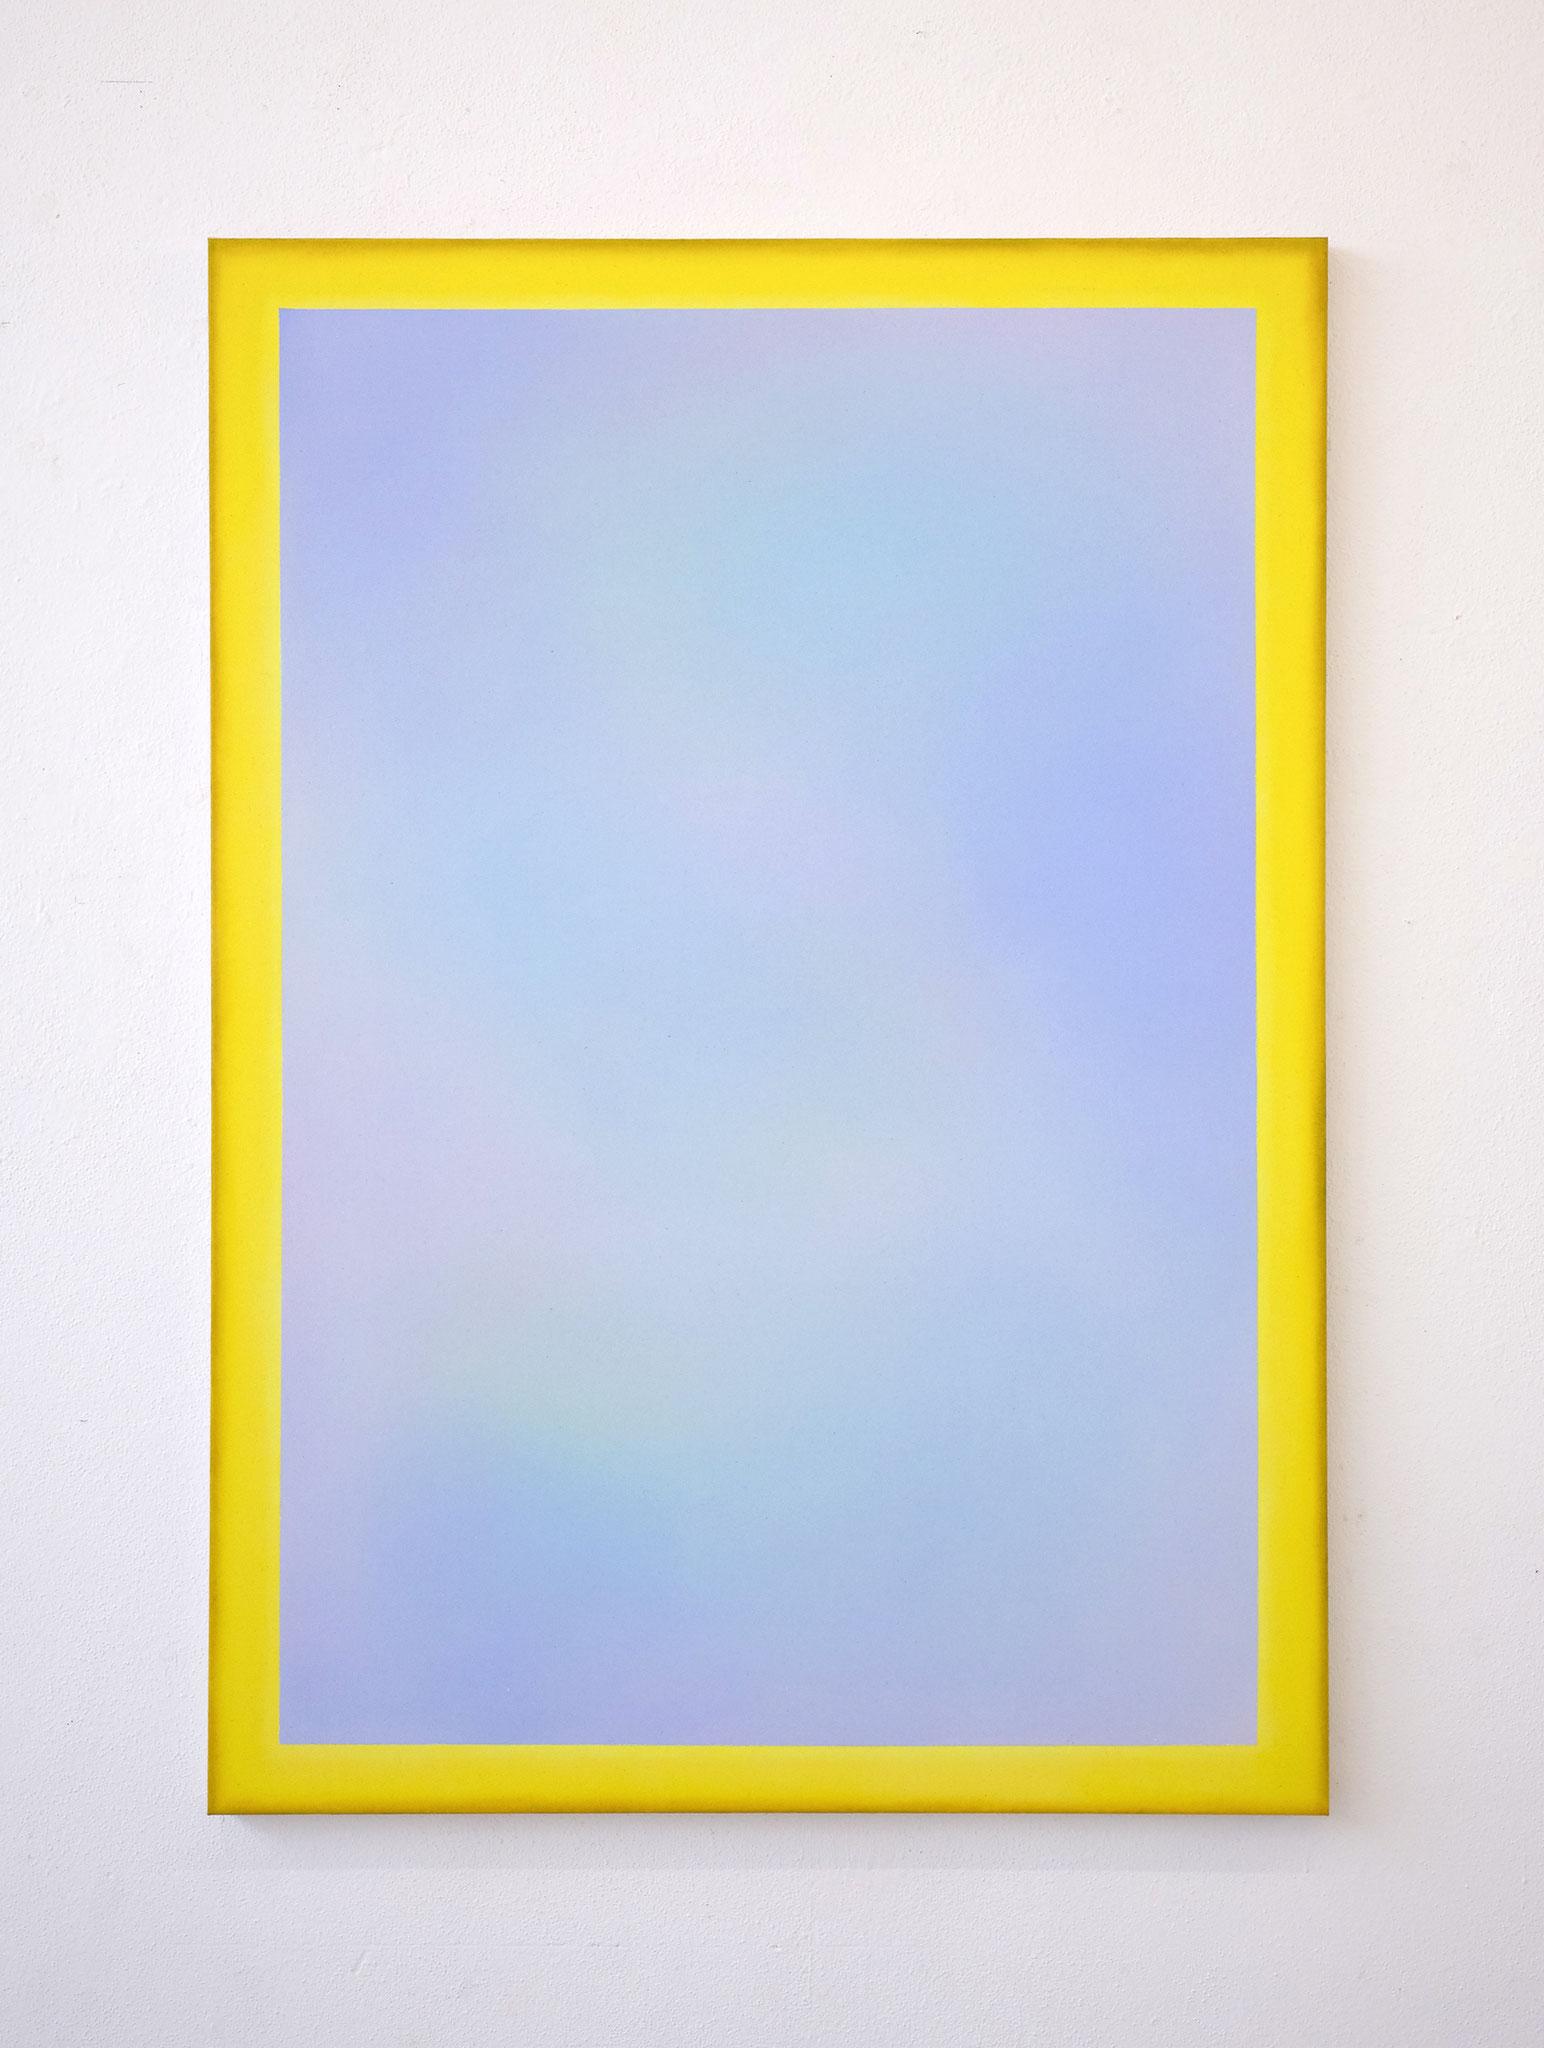 "Alina Birkner ""Untitled (Yellow Frame)"" 2019, 170x120 cm, Acrylic on Canvas"